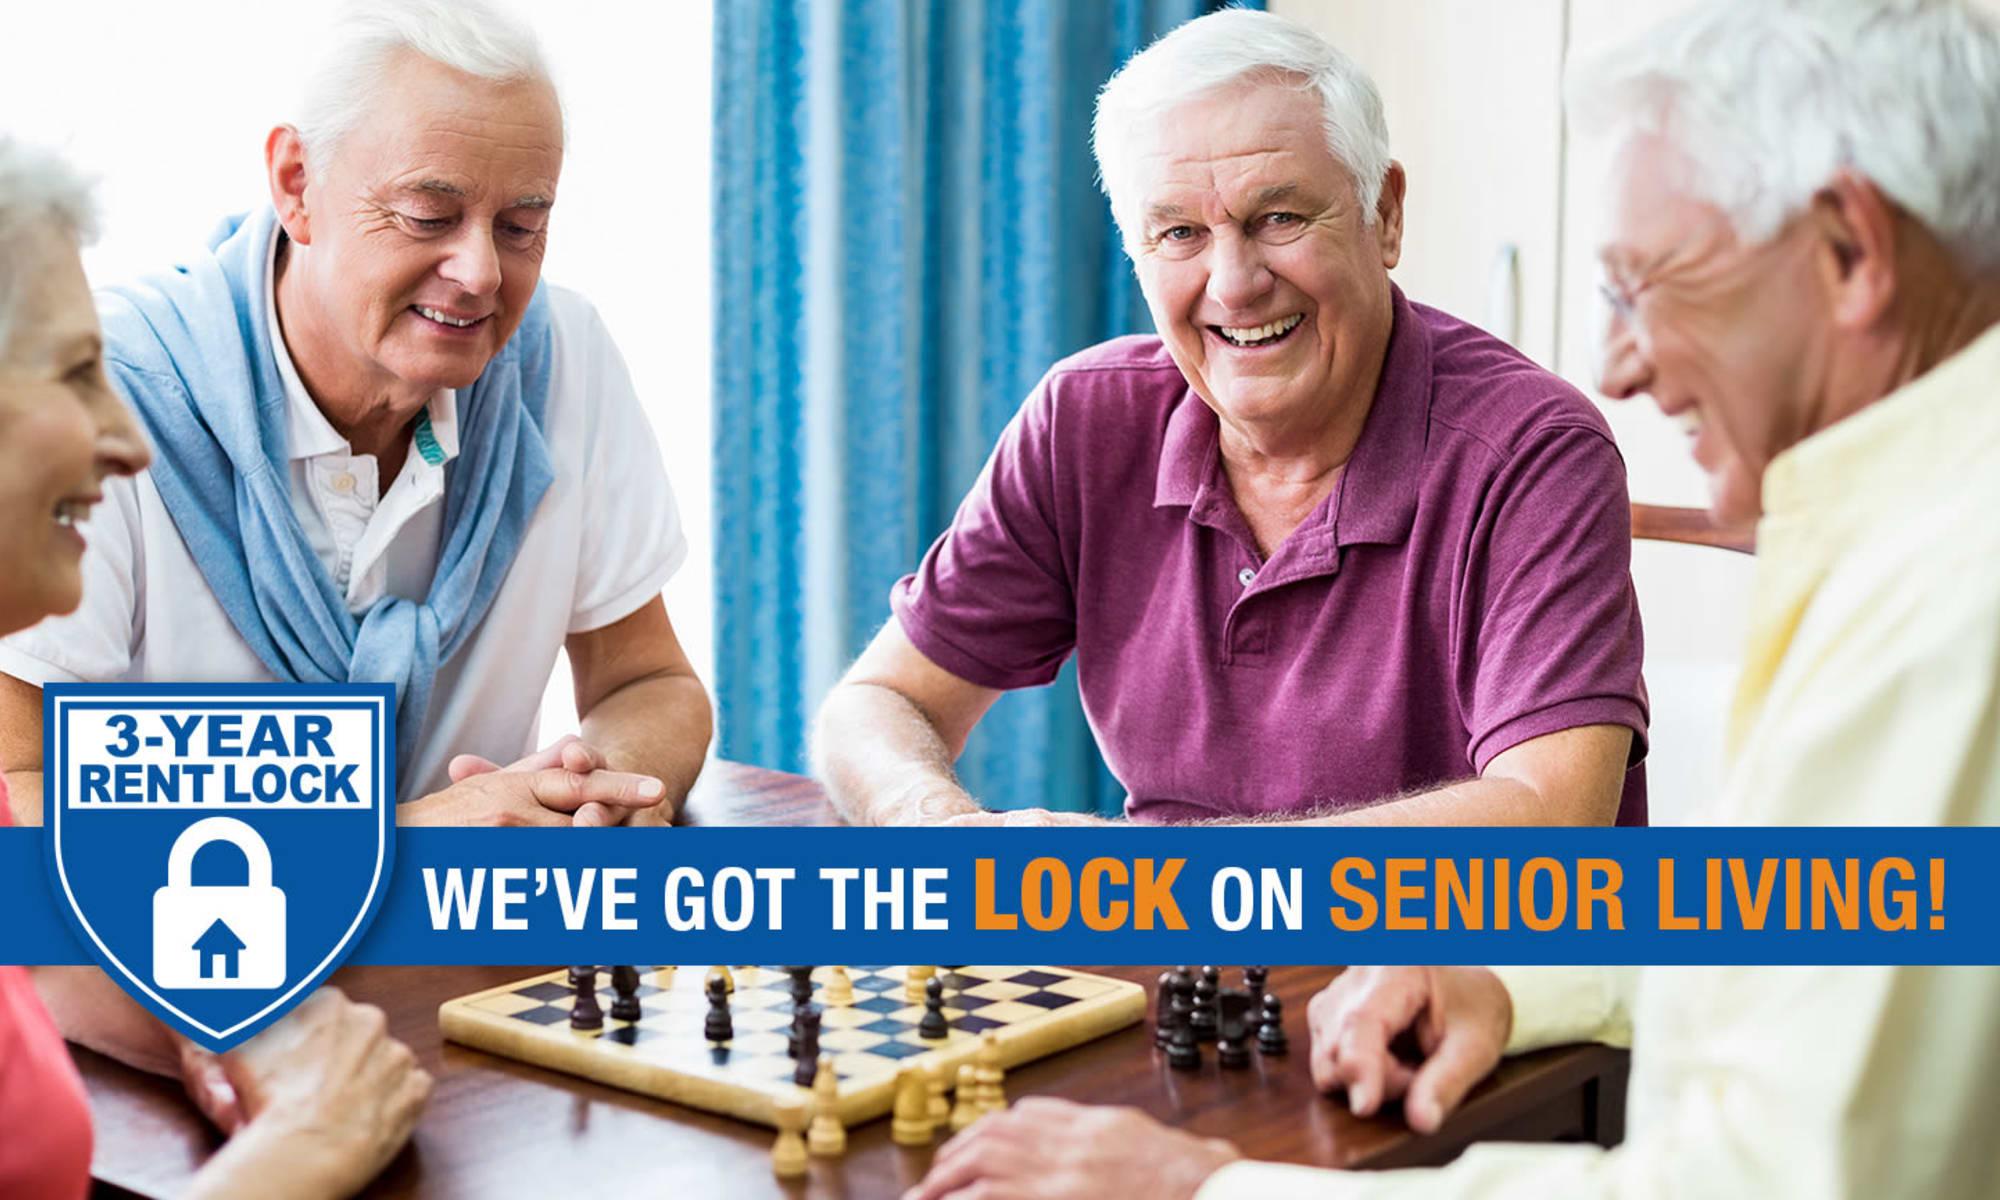 Palm Beach Gardens senior living community has a wonderful clubhouse